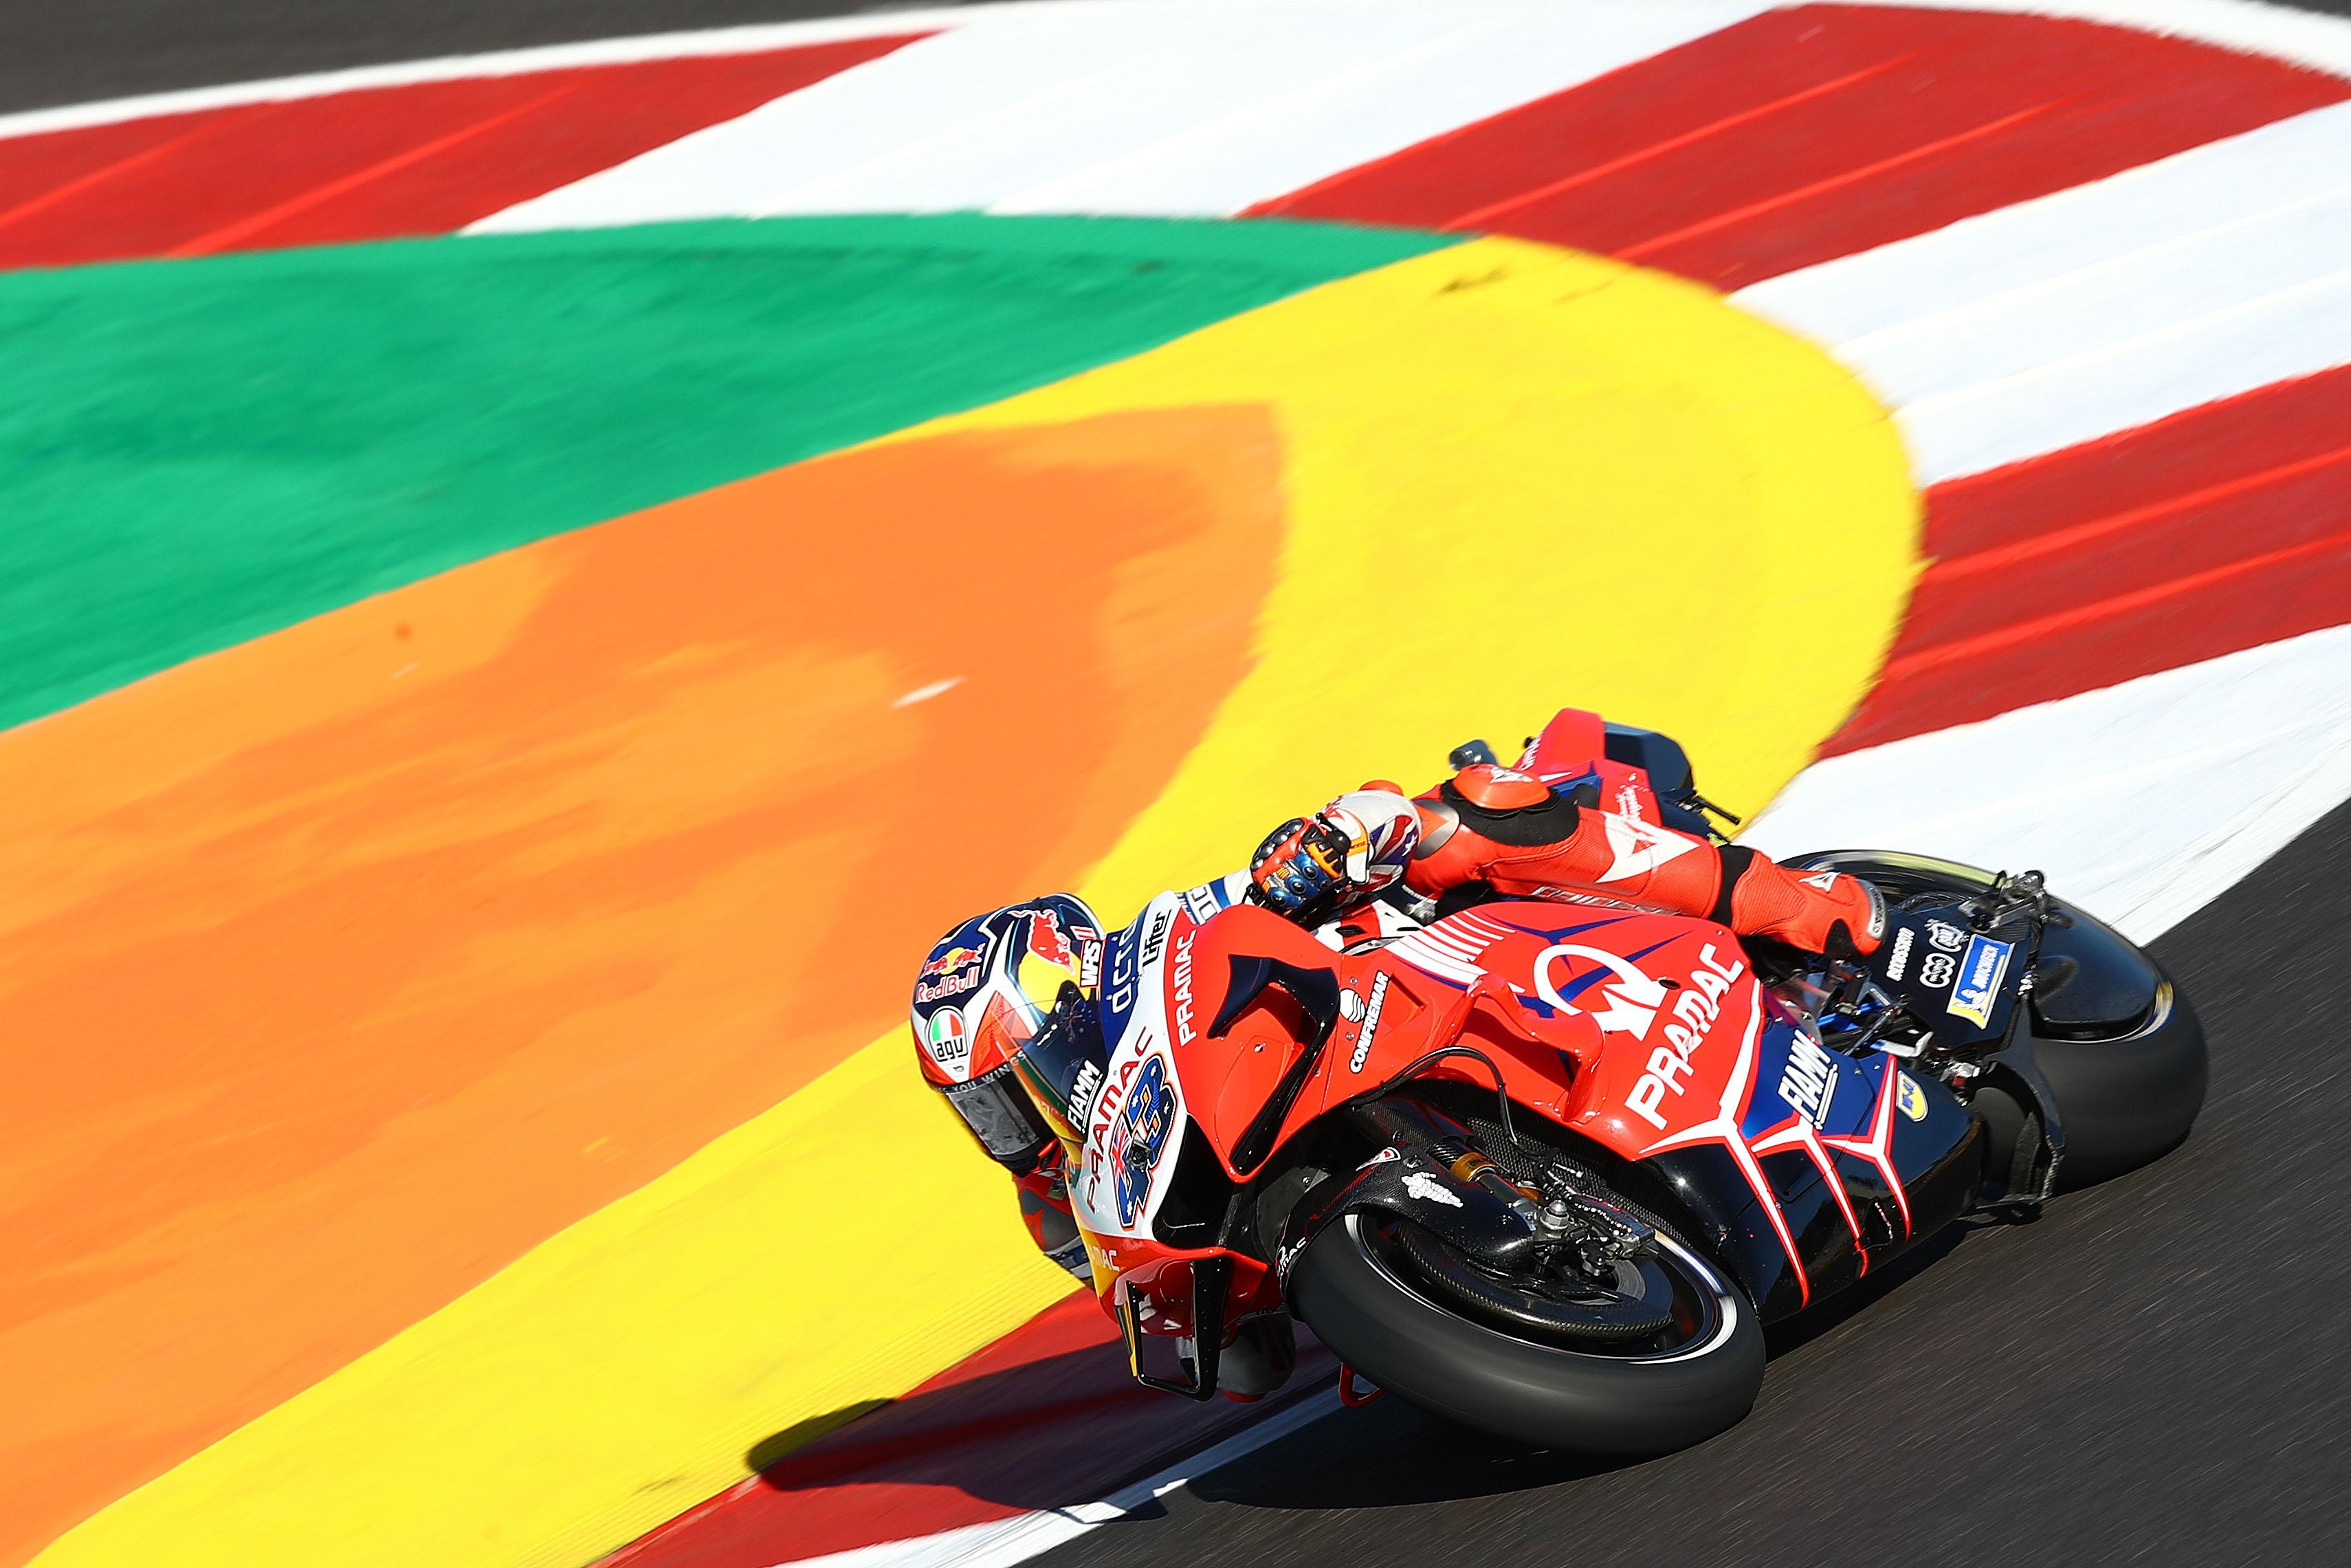 Jack Miller, Pramac Ducati, Portimao, MotoGP